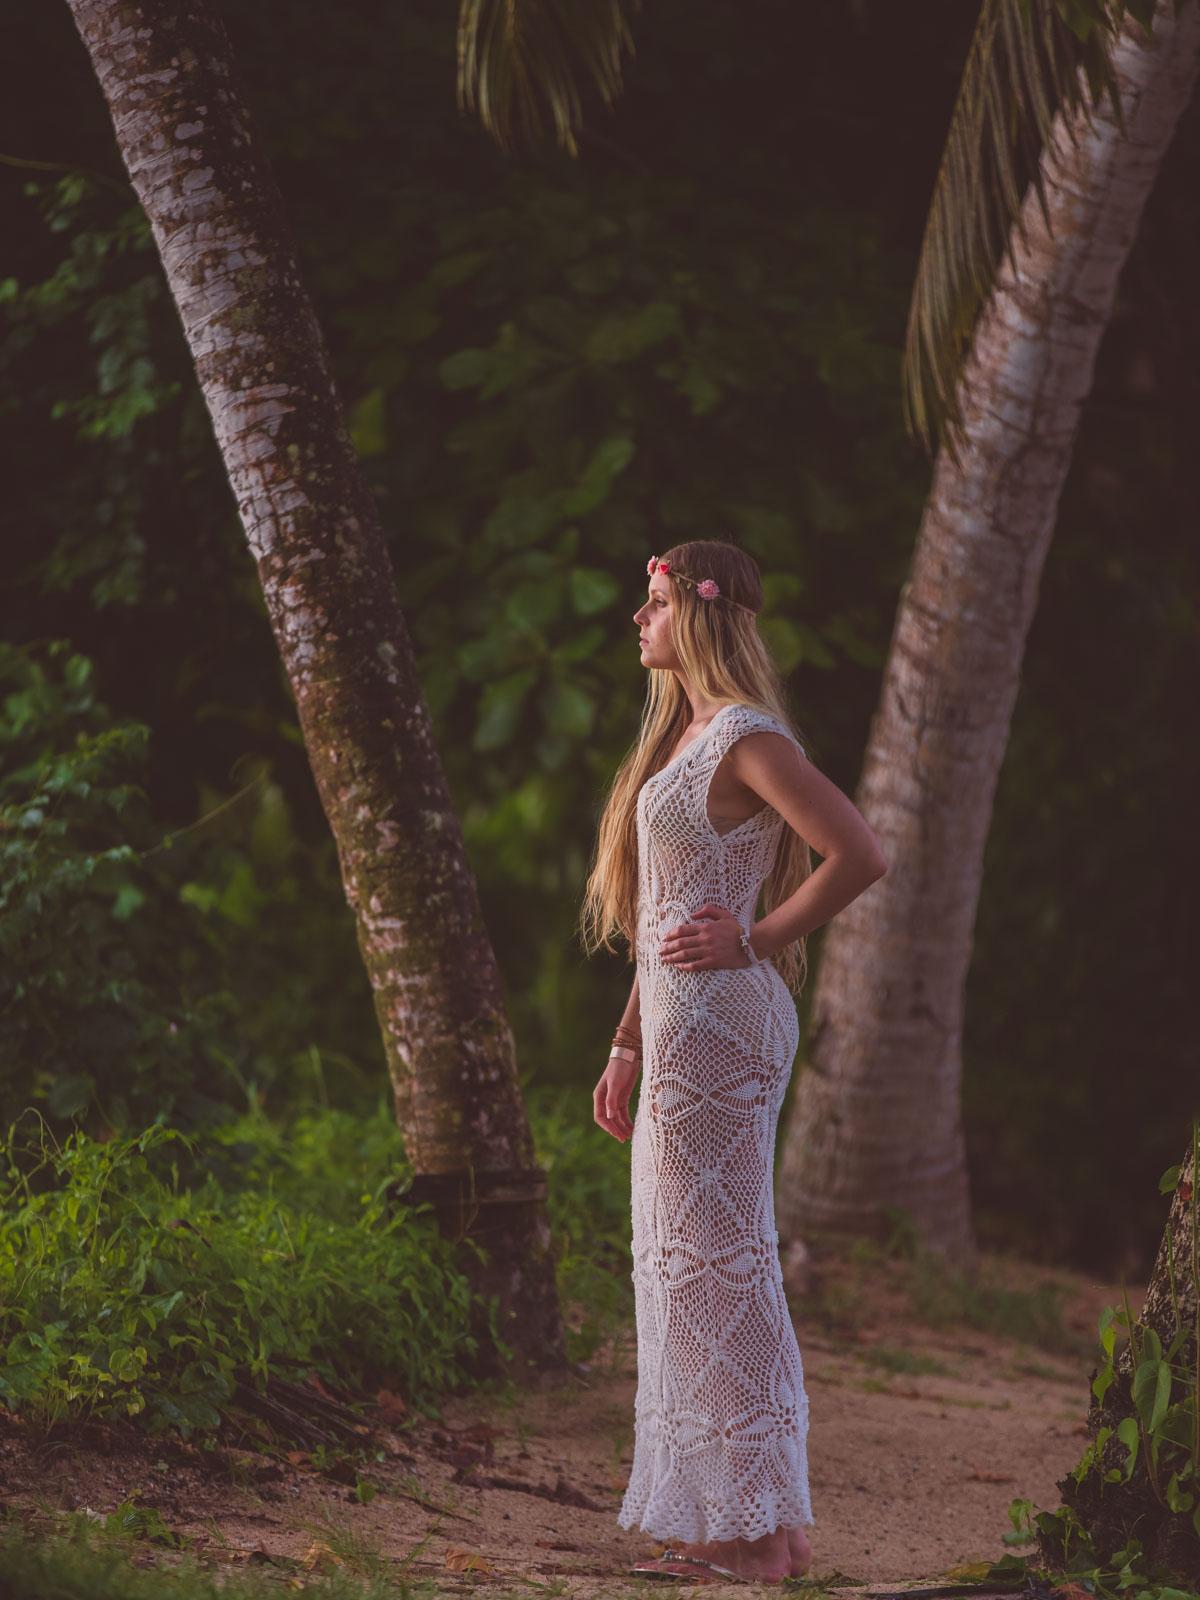 fashion-photography-stockholm-london-kenya-seychelles-12